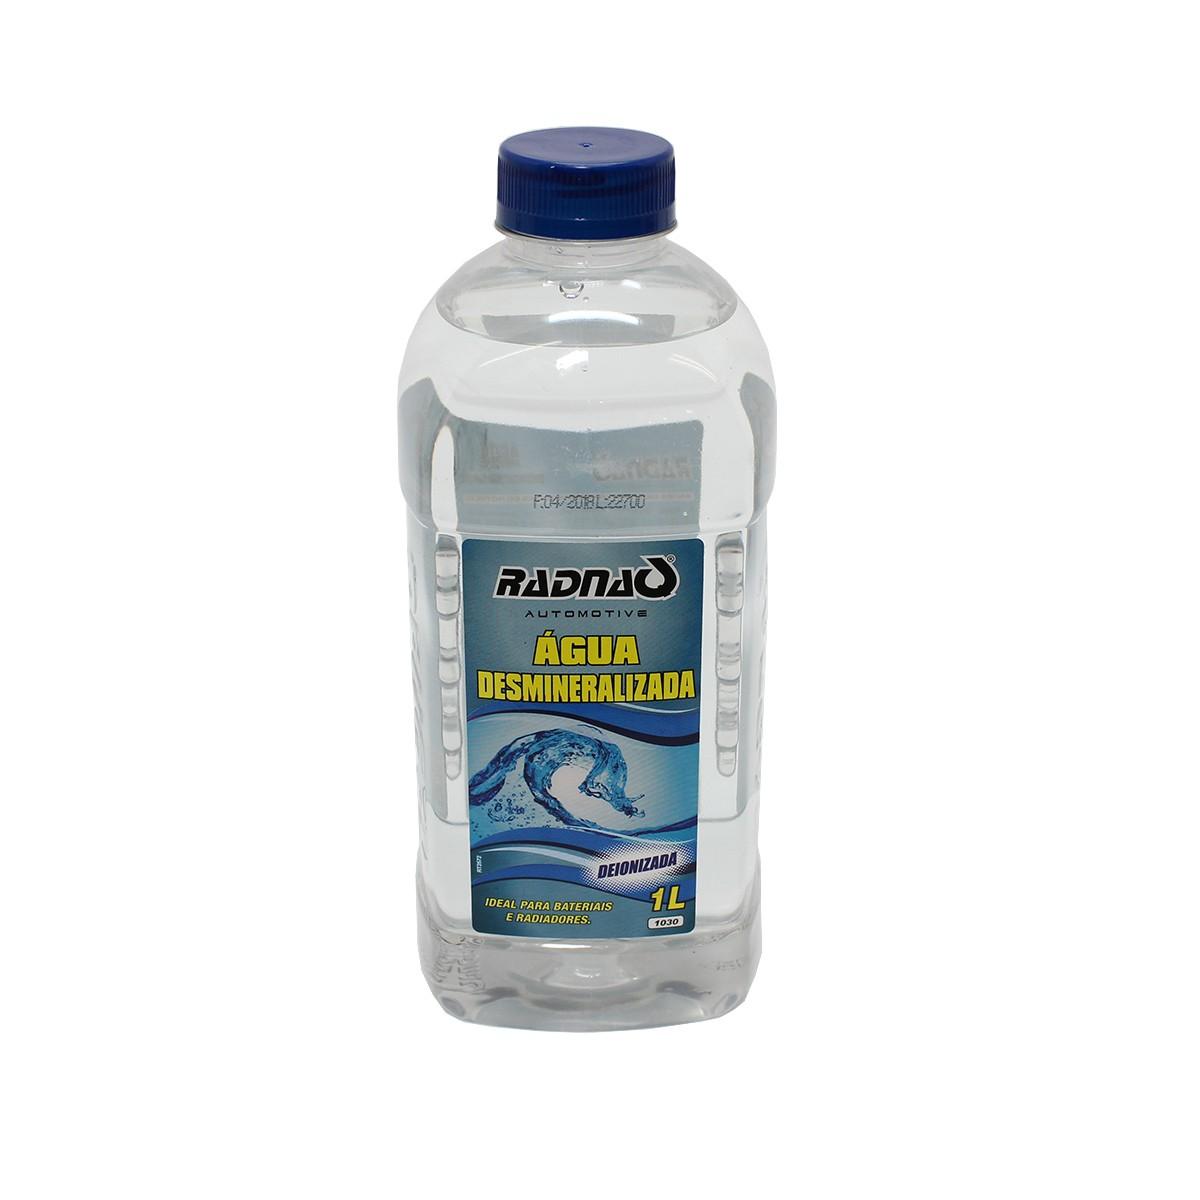 Água desmineralizada Radiador e bateria - Radnaq